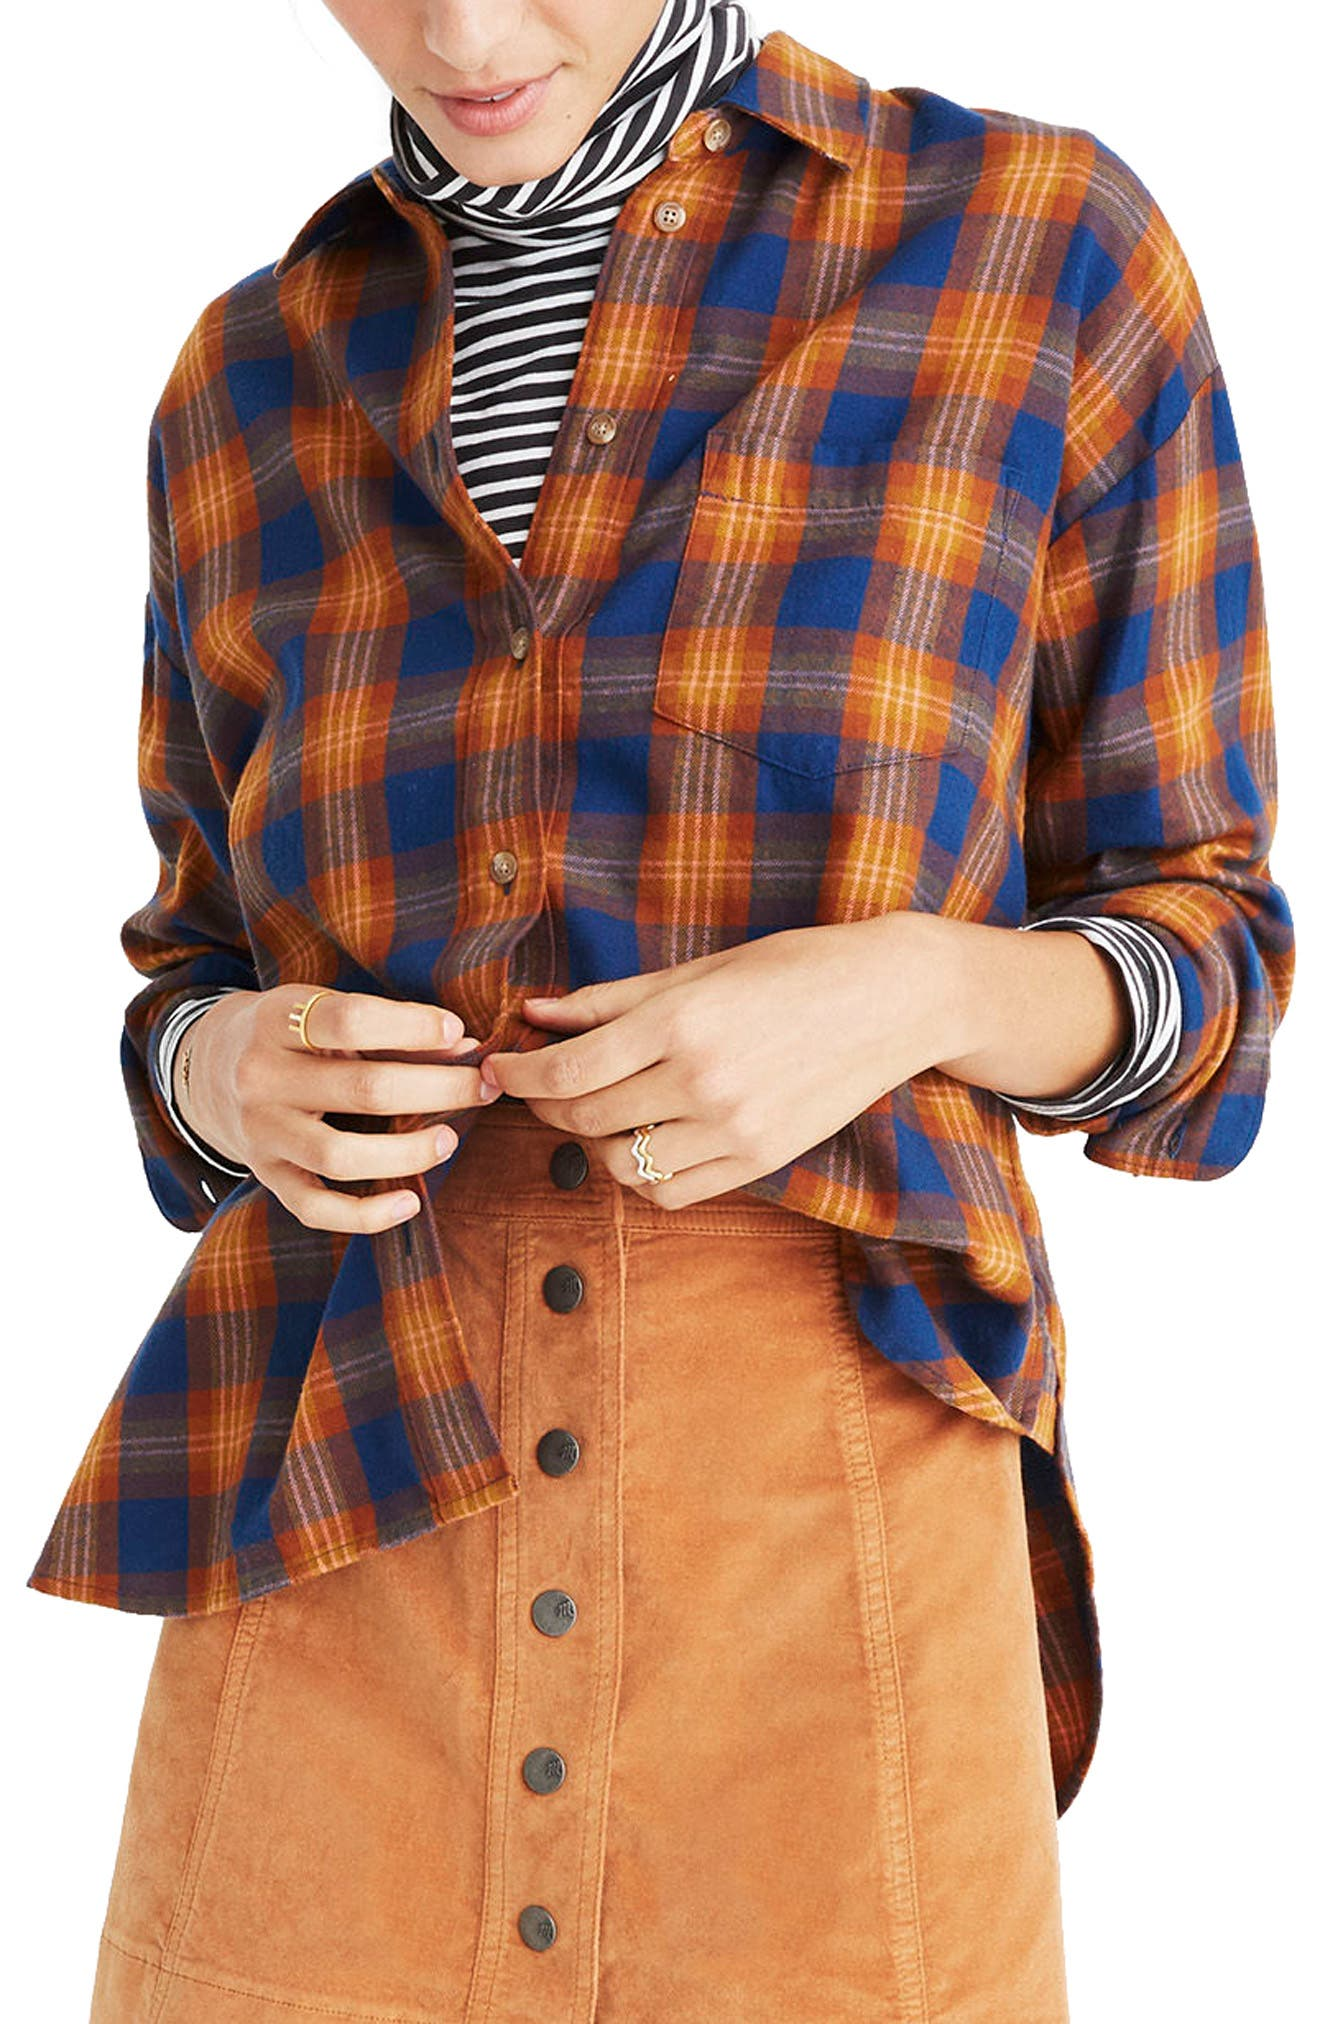 Westward Ardan Plaid Shirt,                         Main,                         color, 400